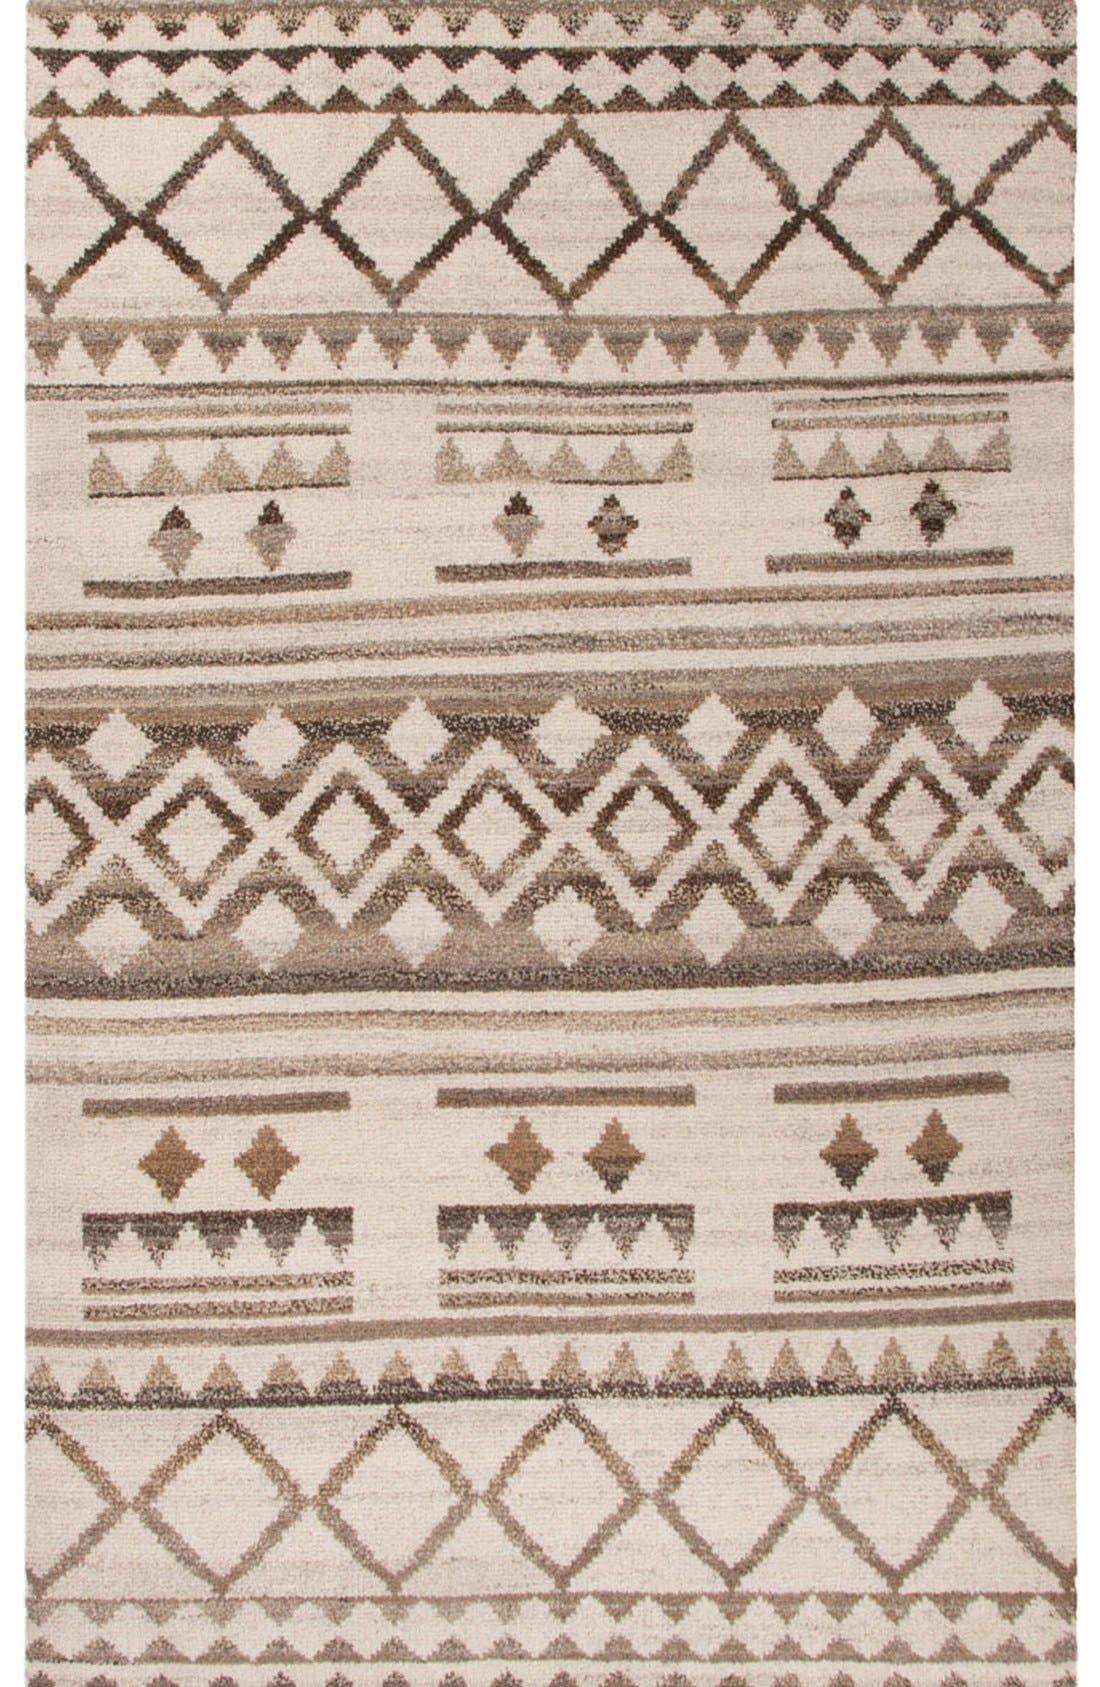 'Vanden Bohemian' Wool Rug,                         Main,                         color, 210